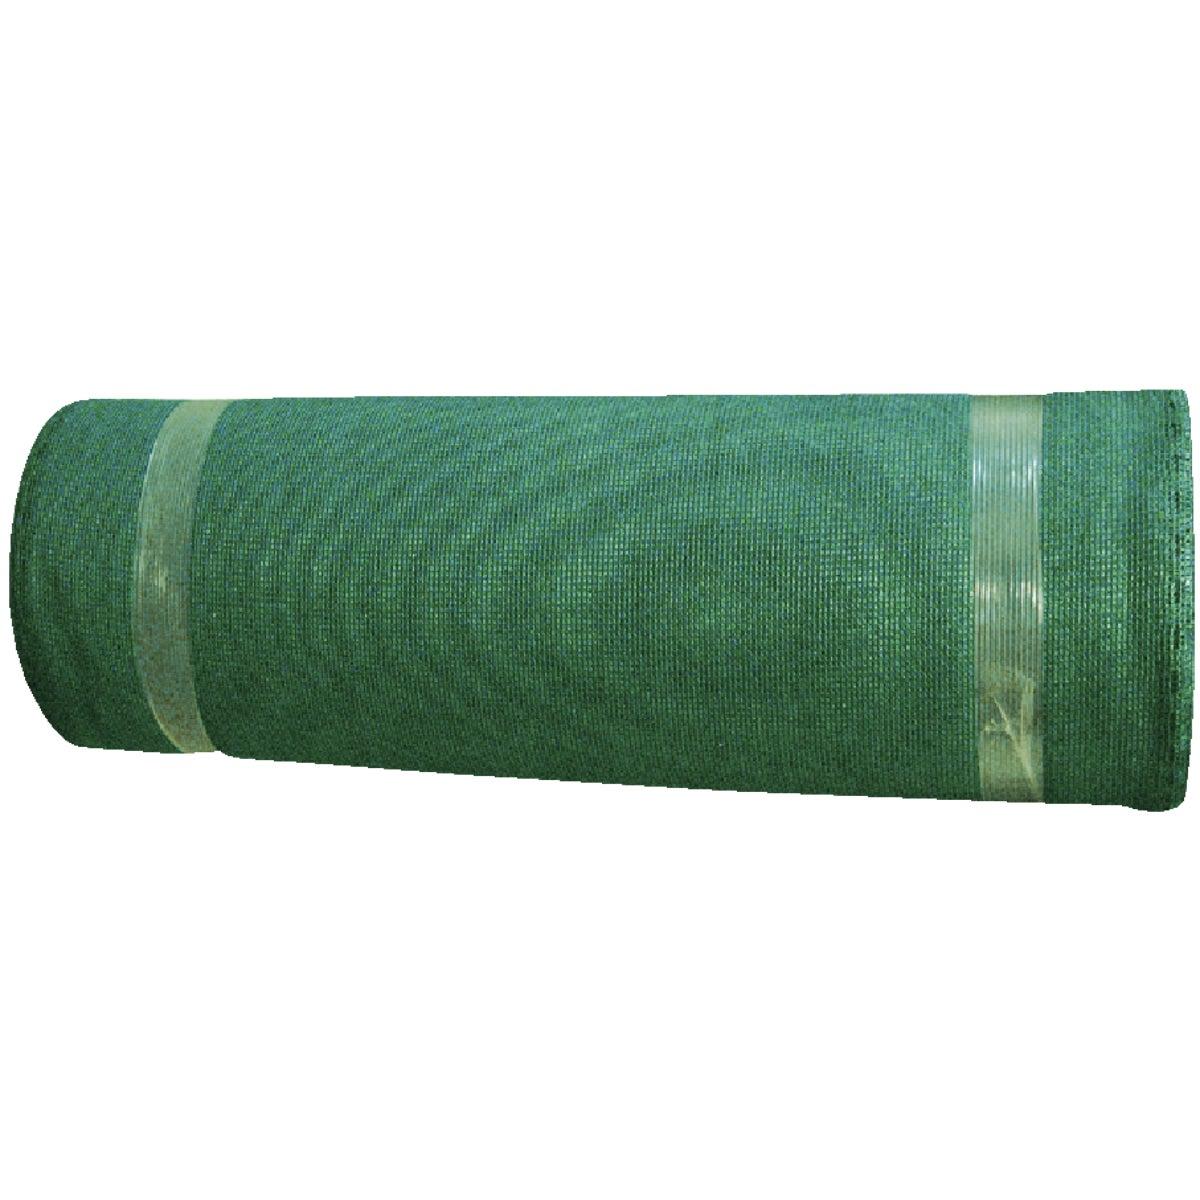 6X100 70% UV GREEN SHADE